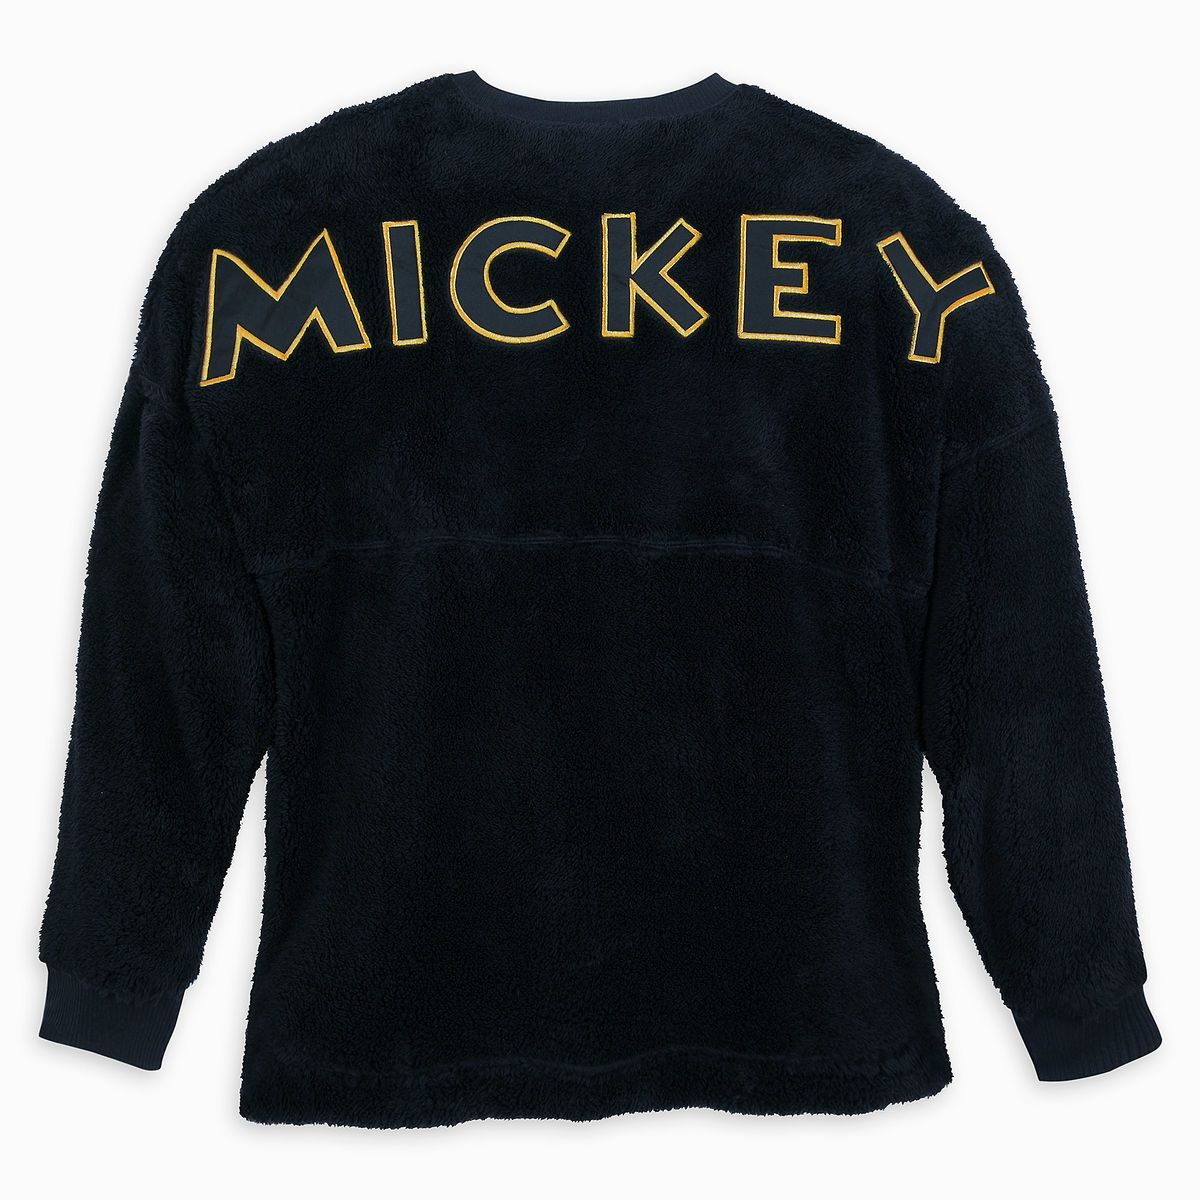 Mickey The True Original Sherpa Spirit Jersey for Adults